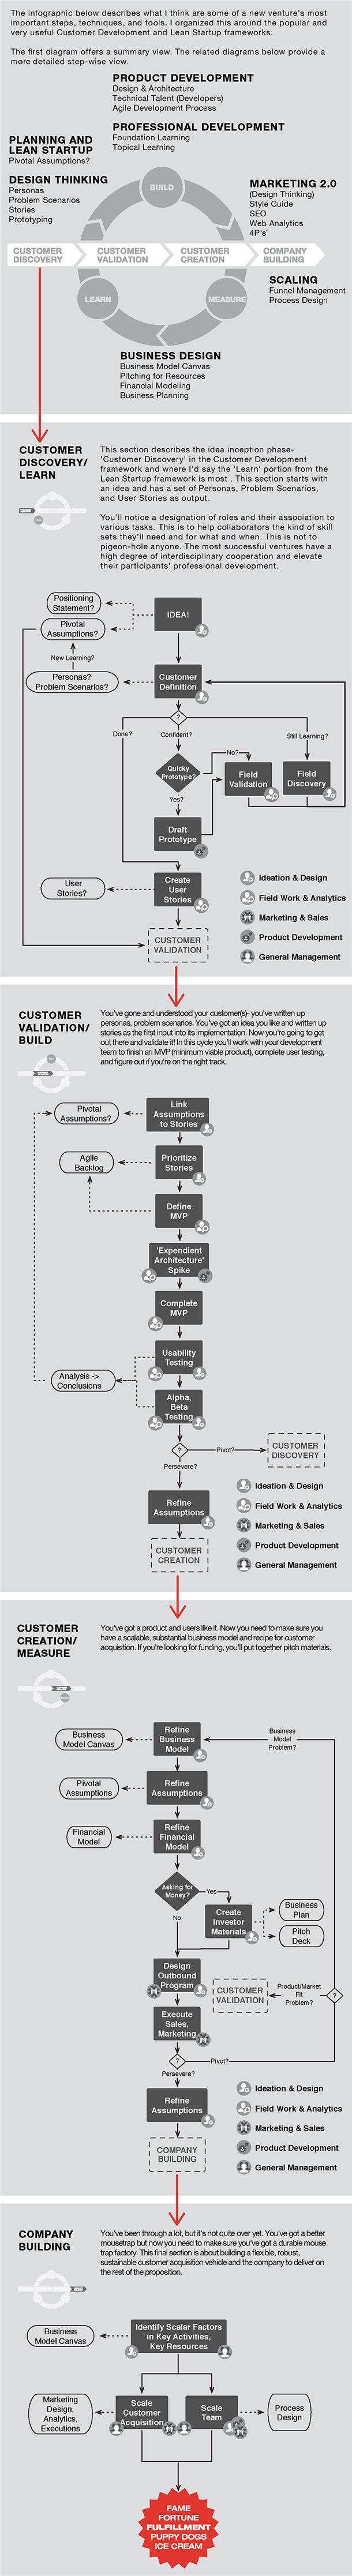 Customer development and Lean Startup #custdev #LeanStartup #infographic http://www.tykans.com